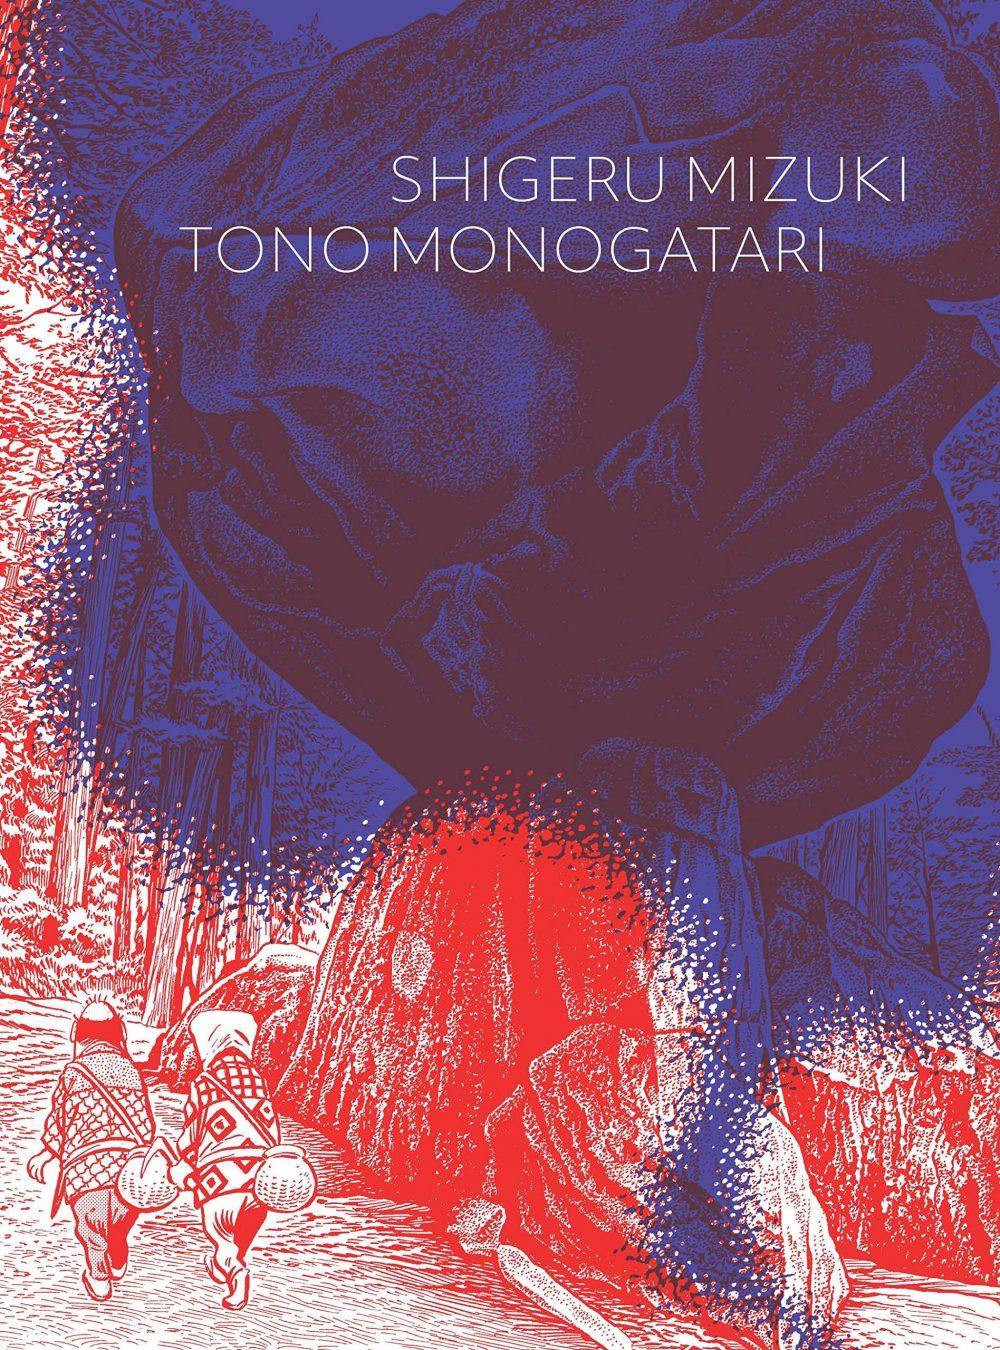 Tono Monogatari, Shigeru Mizuki, Zack Davisson (trans) (Drawn & Quarterly, March 2021)